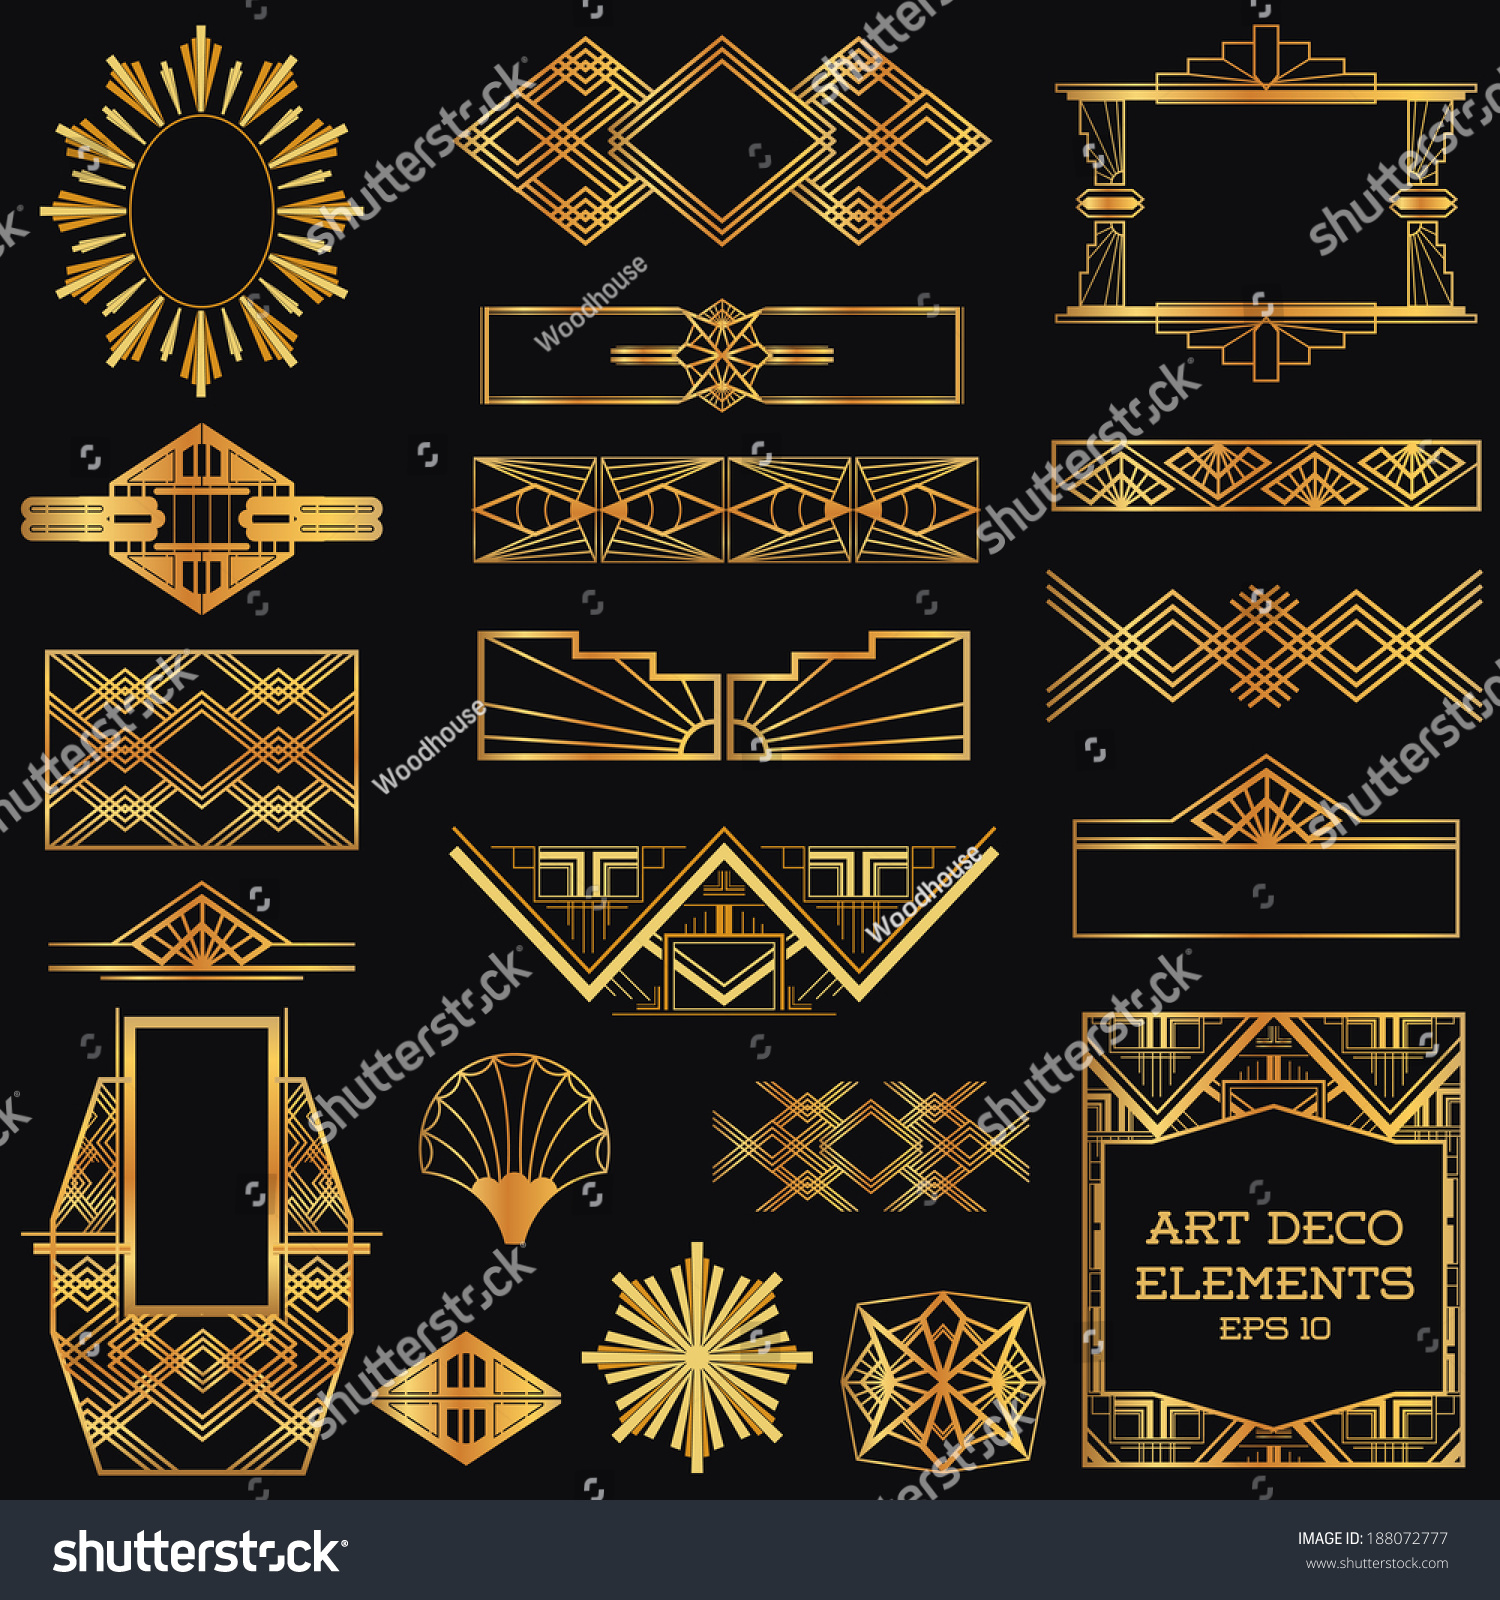 Art Deco Vintage Frames Design Elements Stock Vector